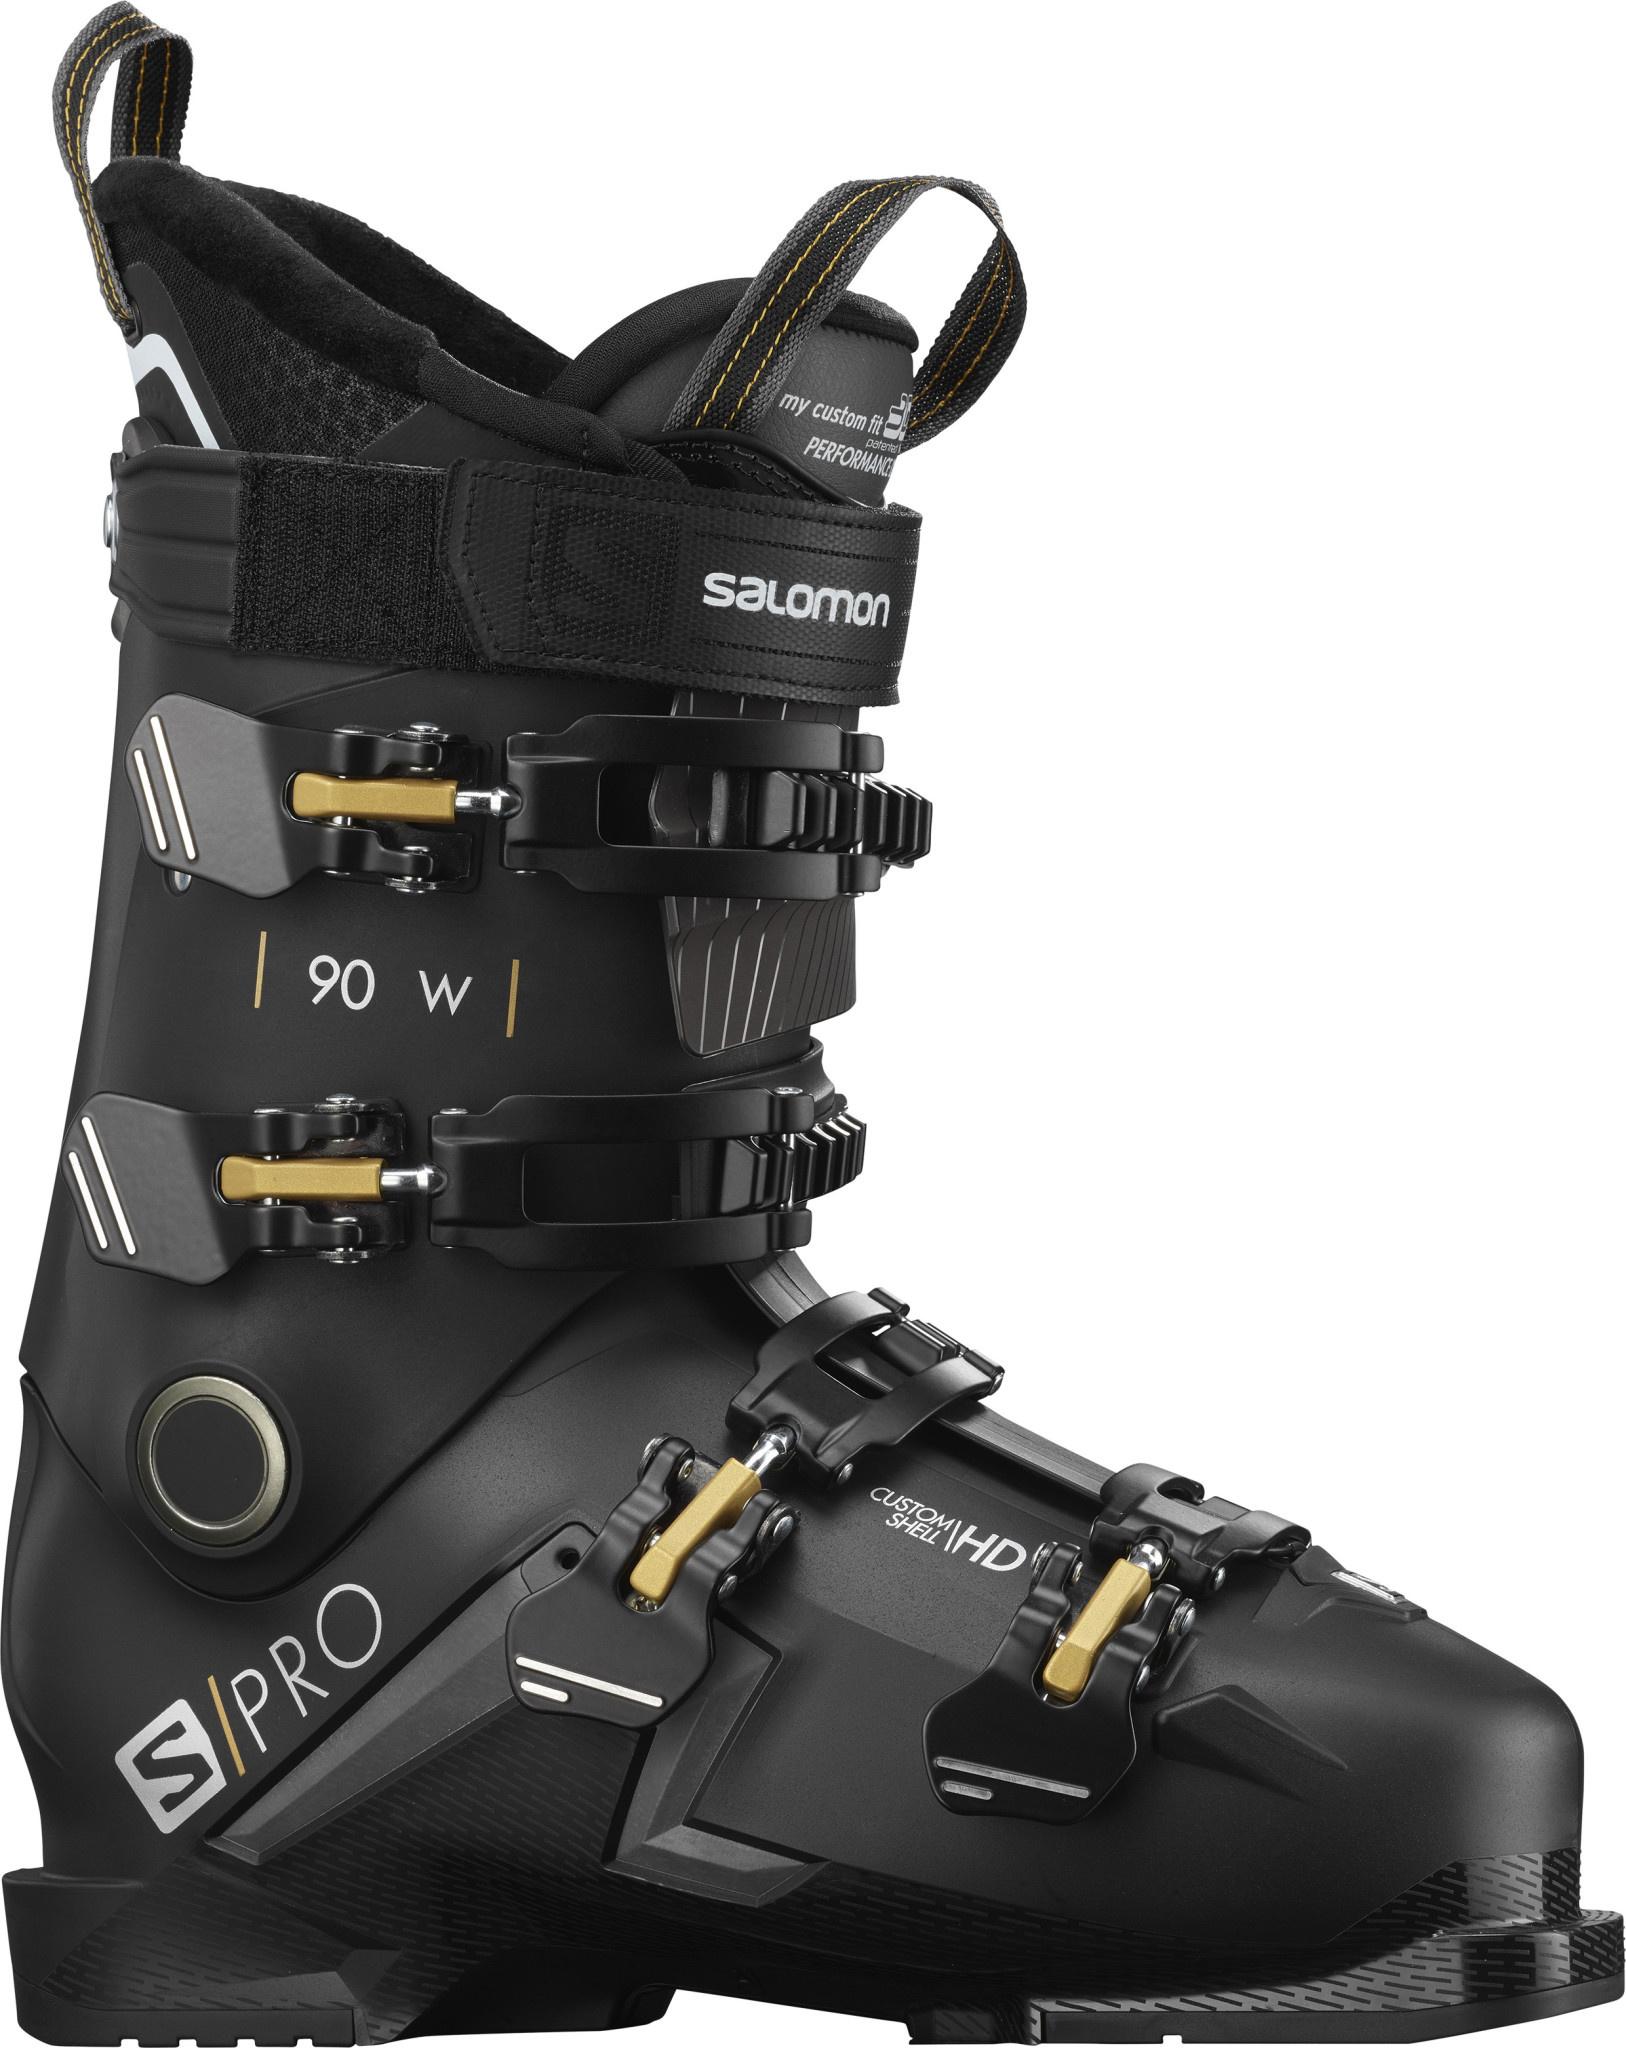 Salomon S/Pro 90 W-1